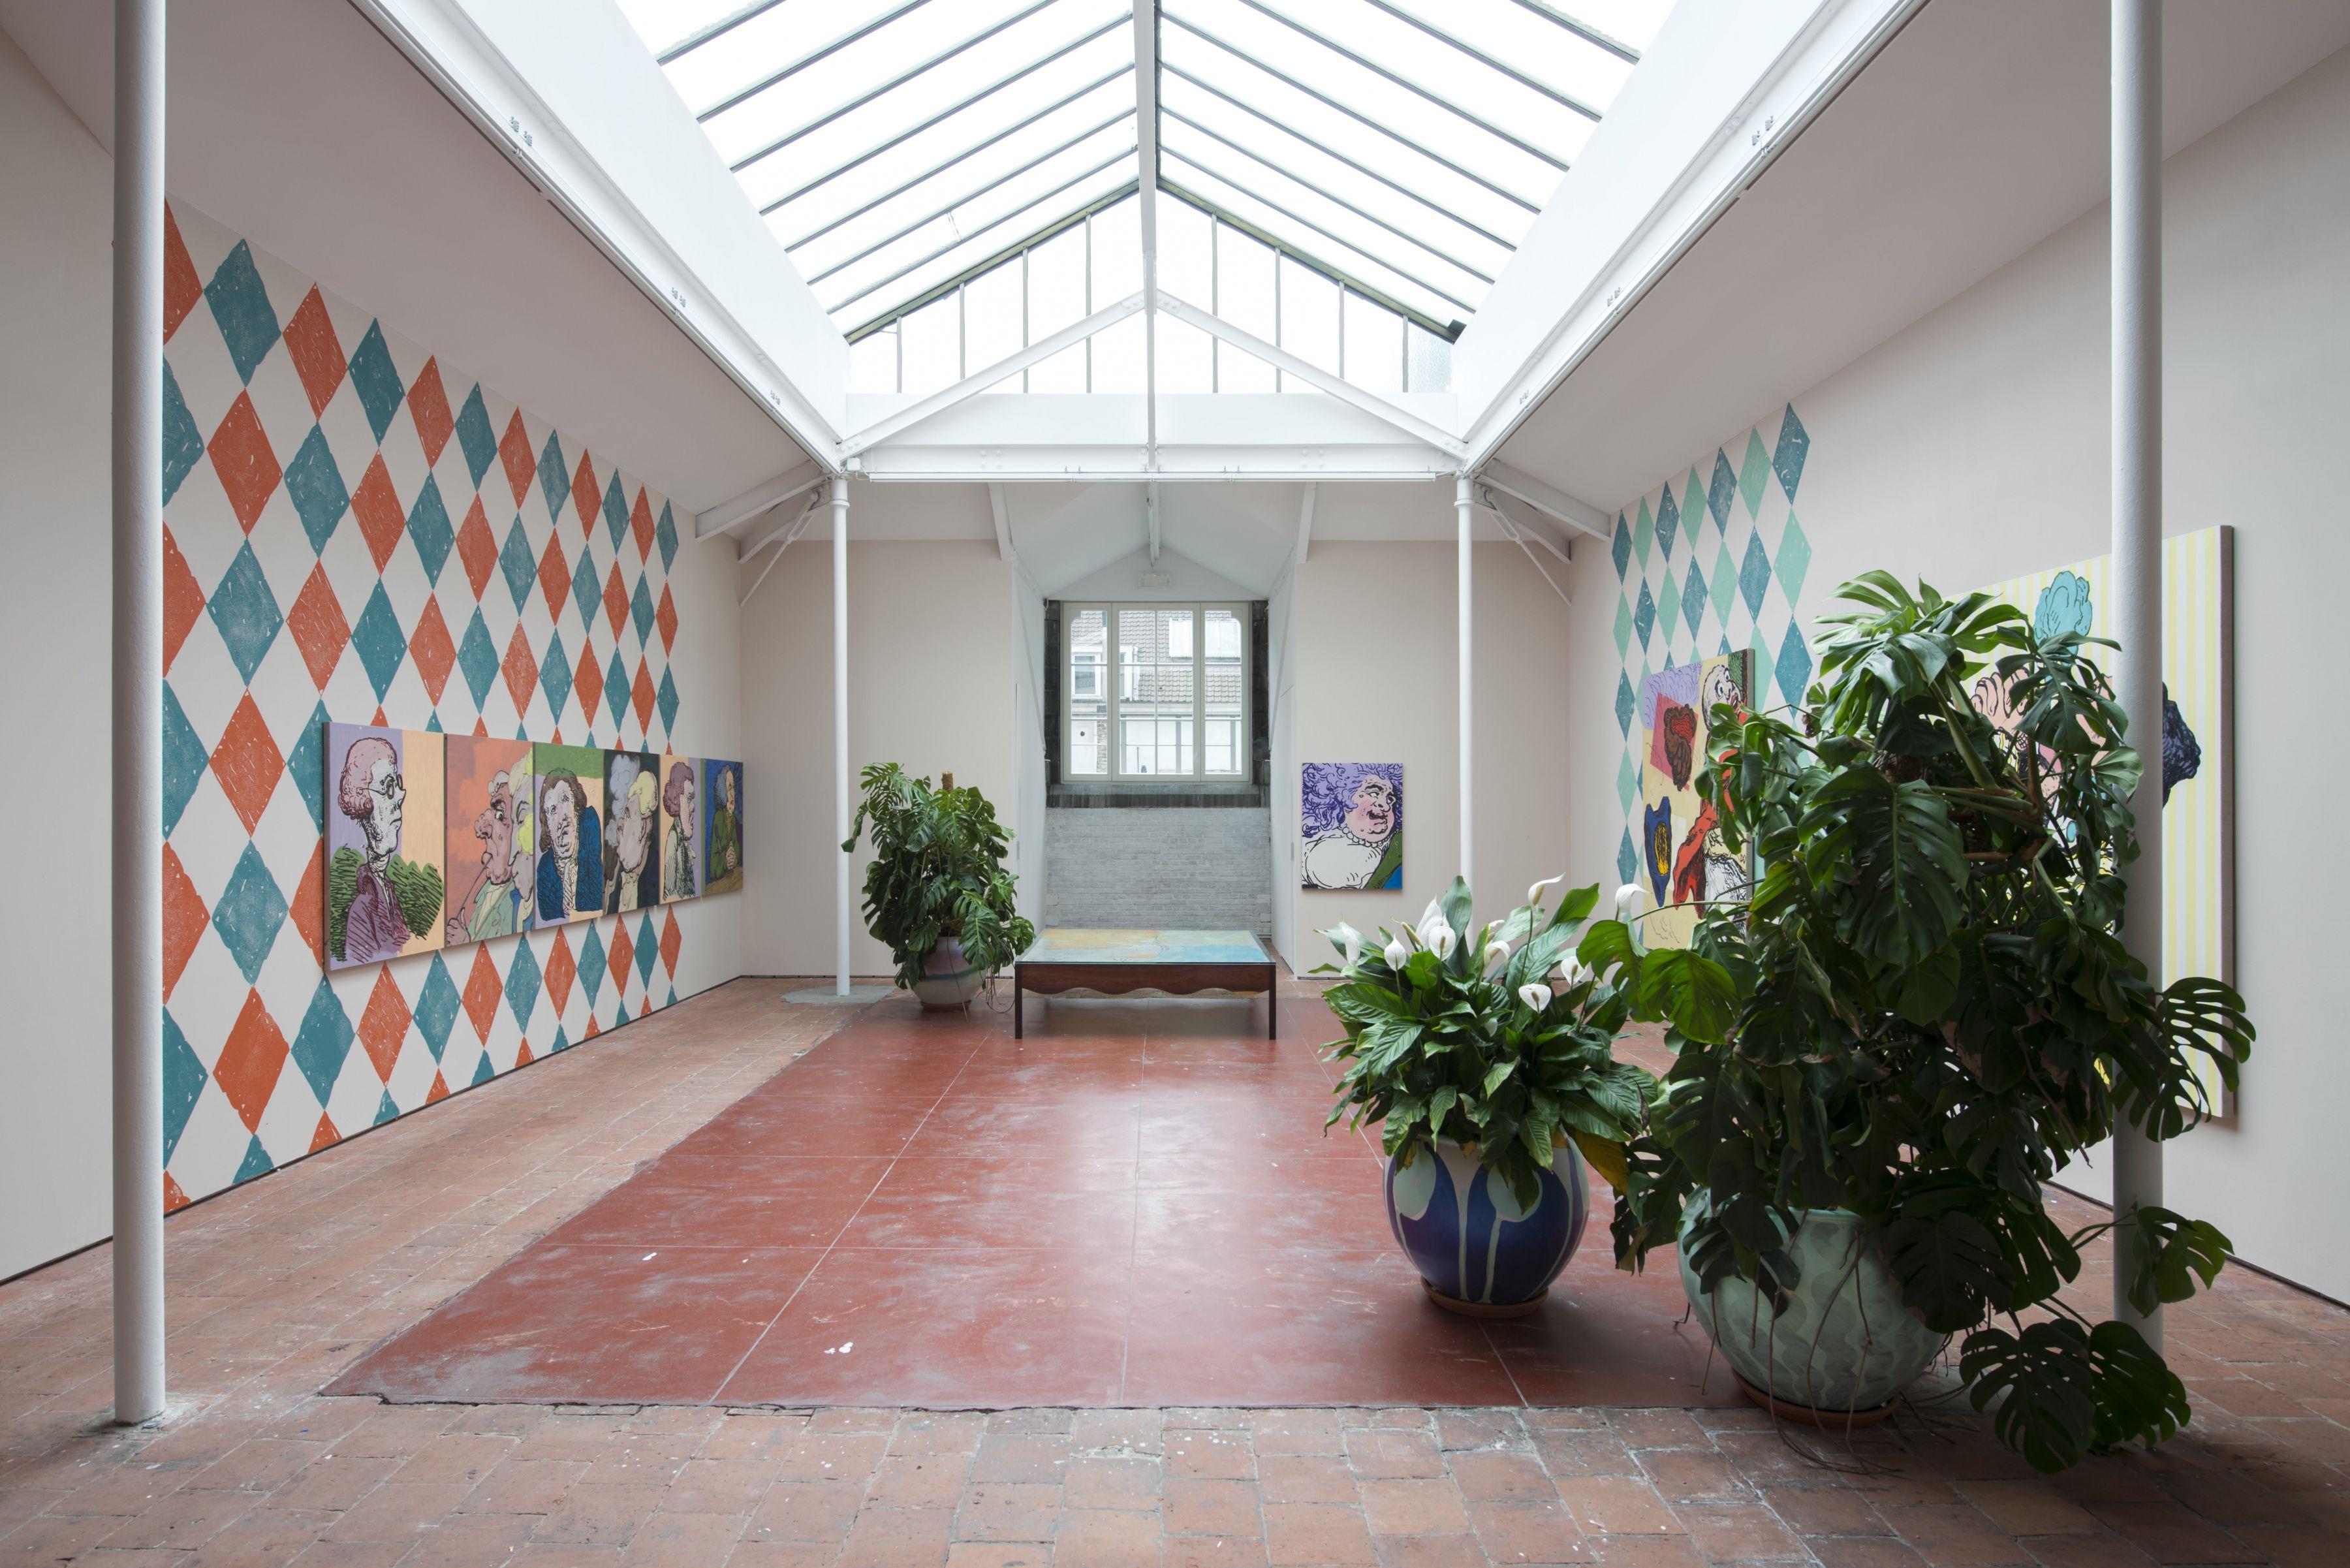 Charlie Billingham, exhibition view, Independent Régence, Brussels, 2017